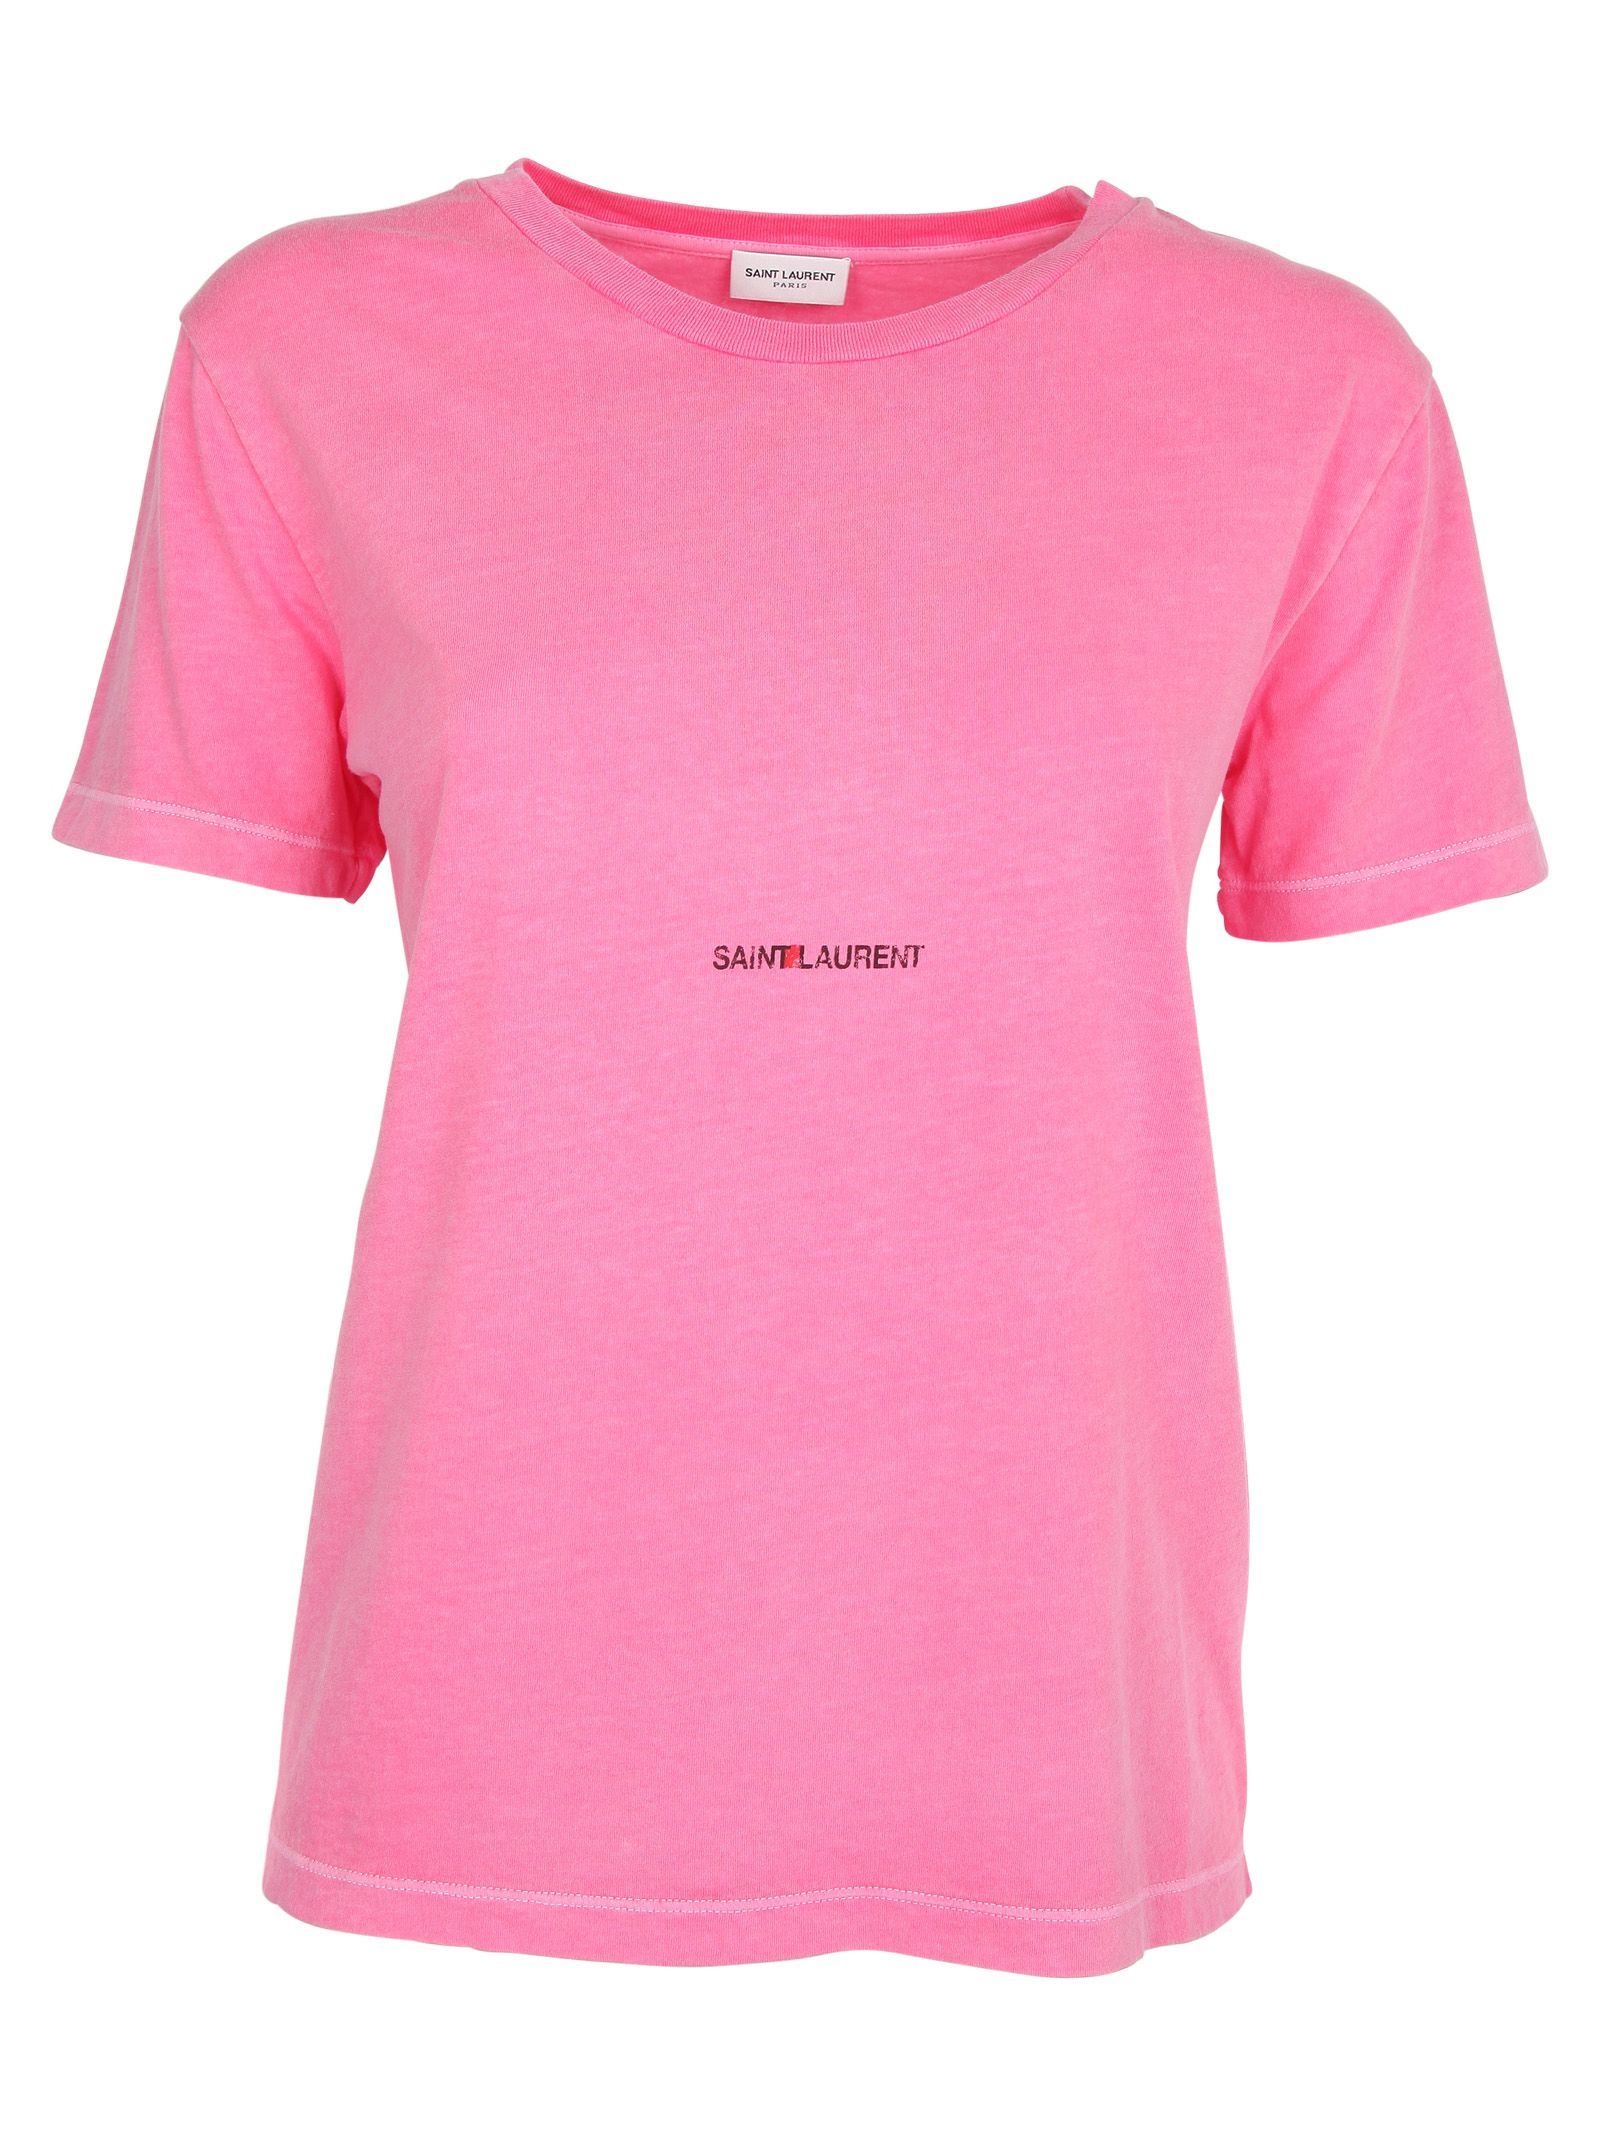 Saint Laurent Paris Logo Printed T-shirt